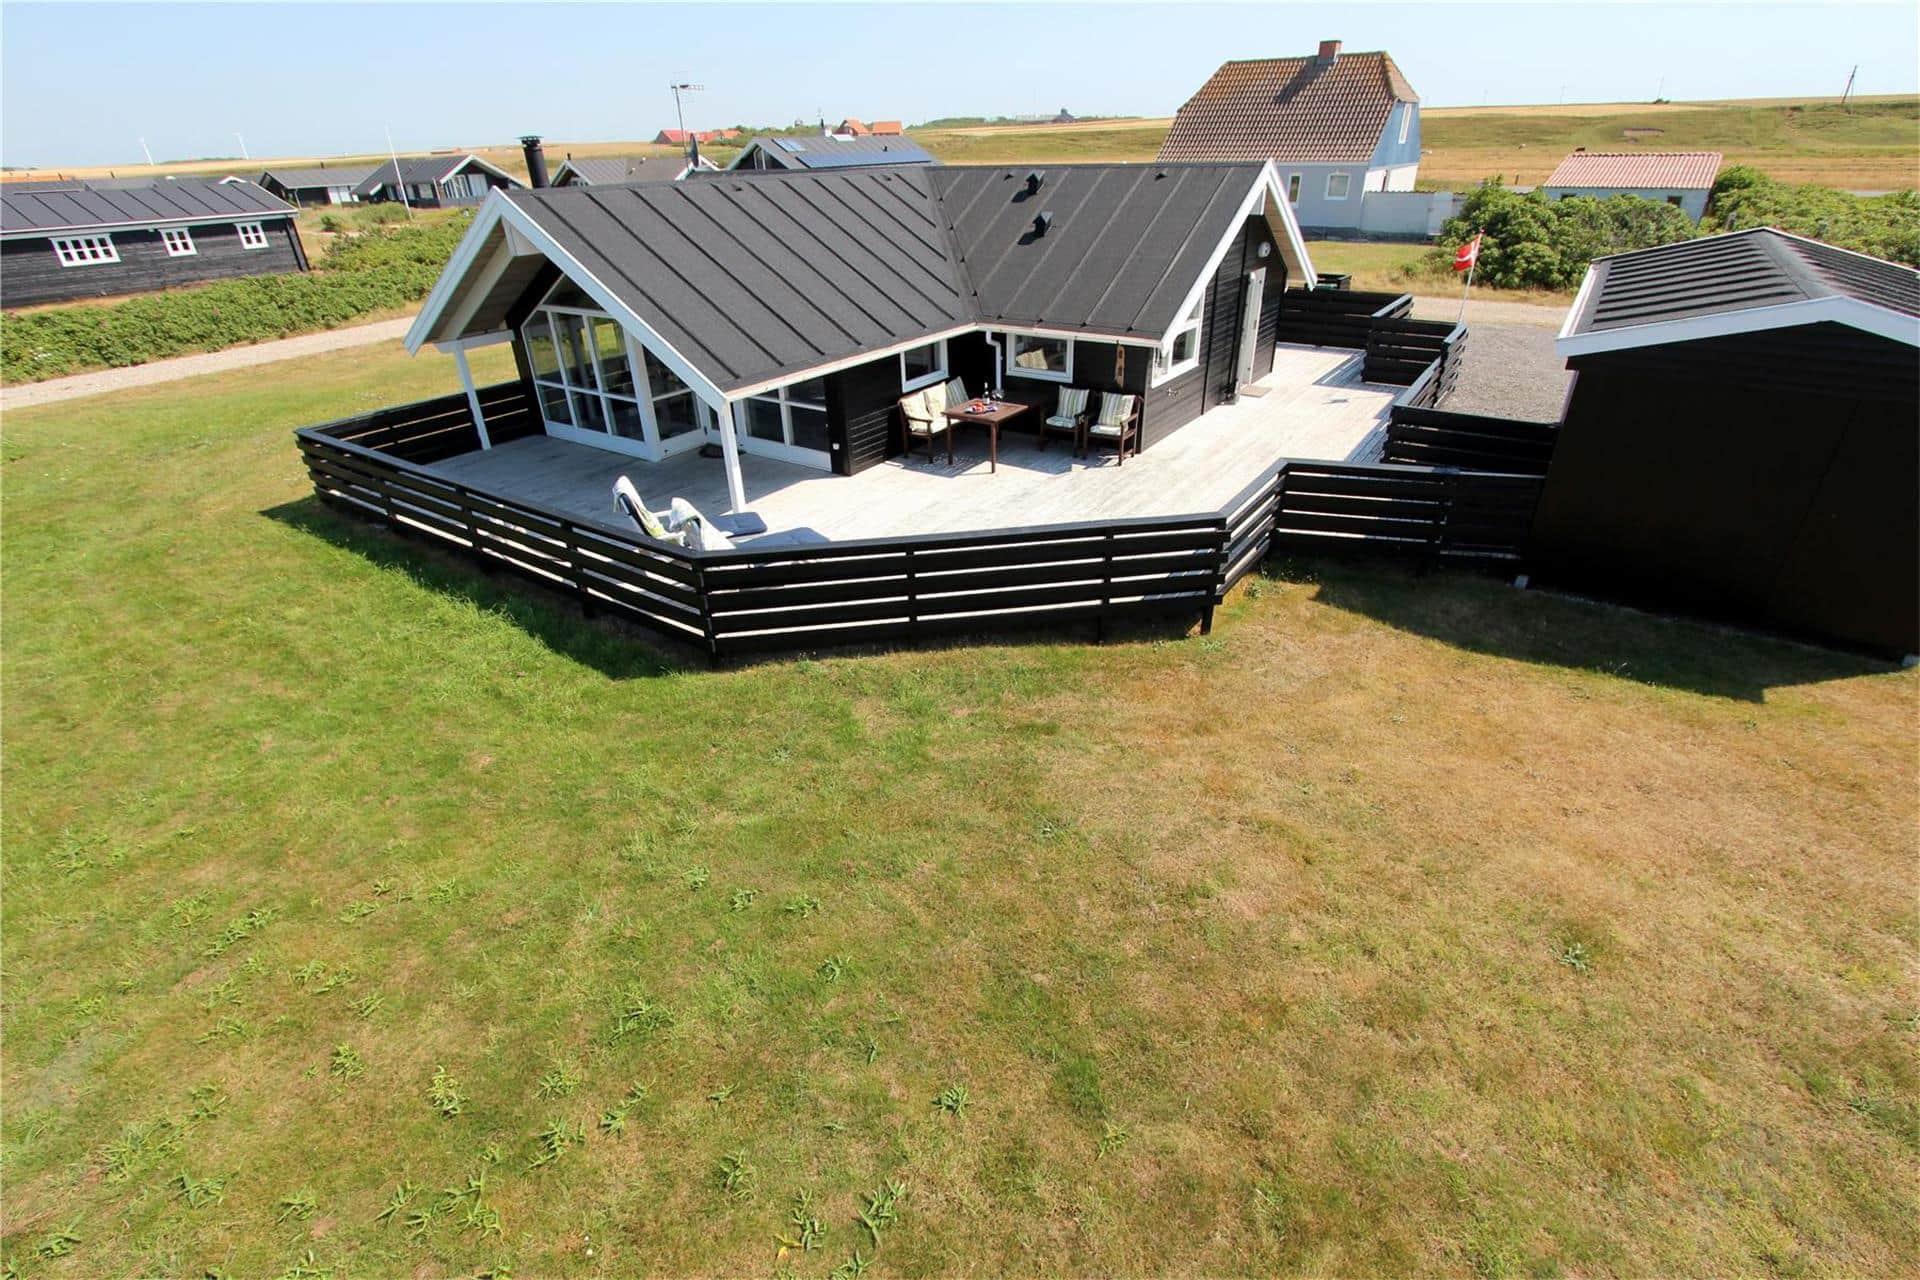 Billede 1-20 Sommerhus 507, Lyngsletten 11, DK - 7620 Lemvig